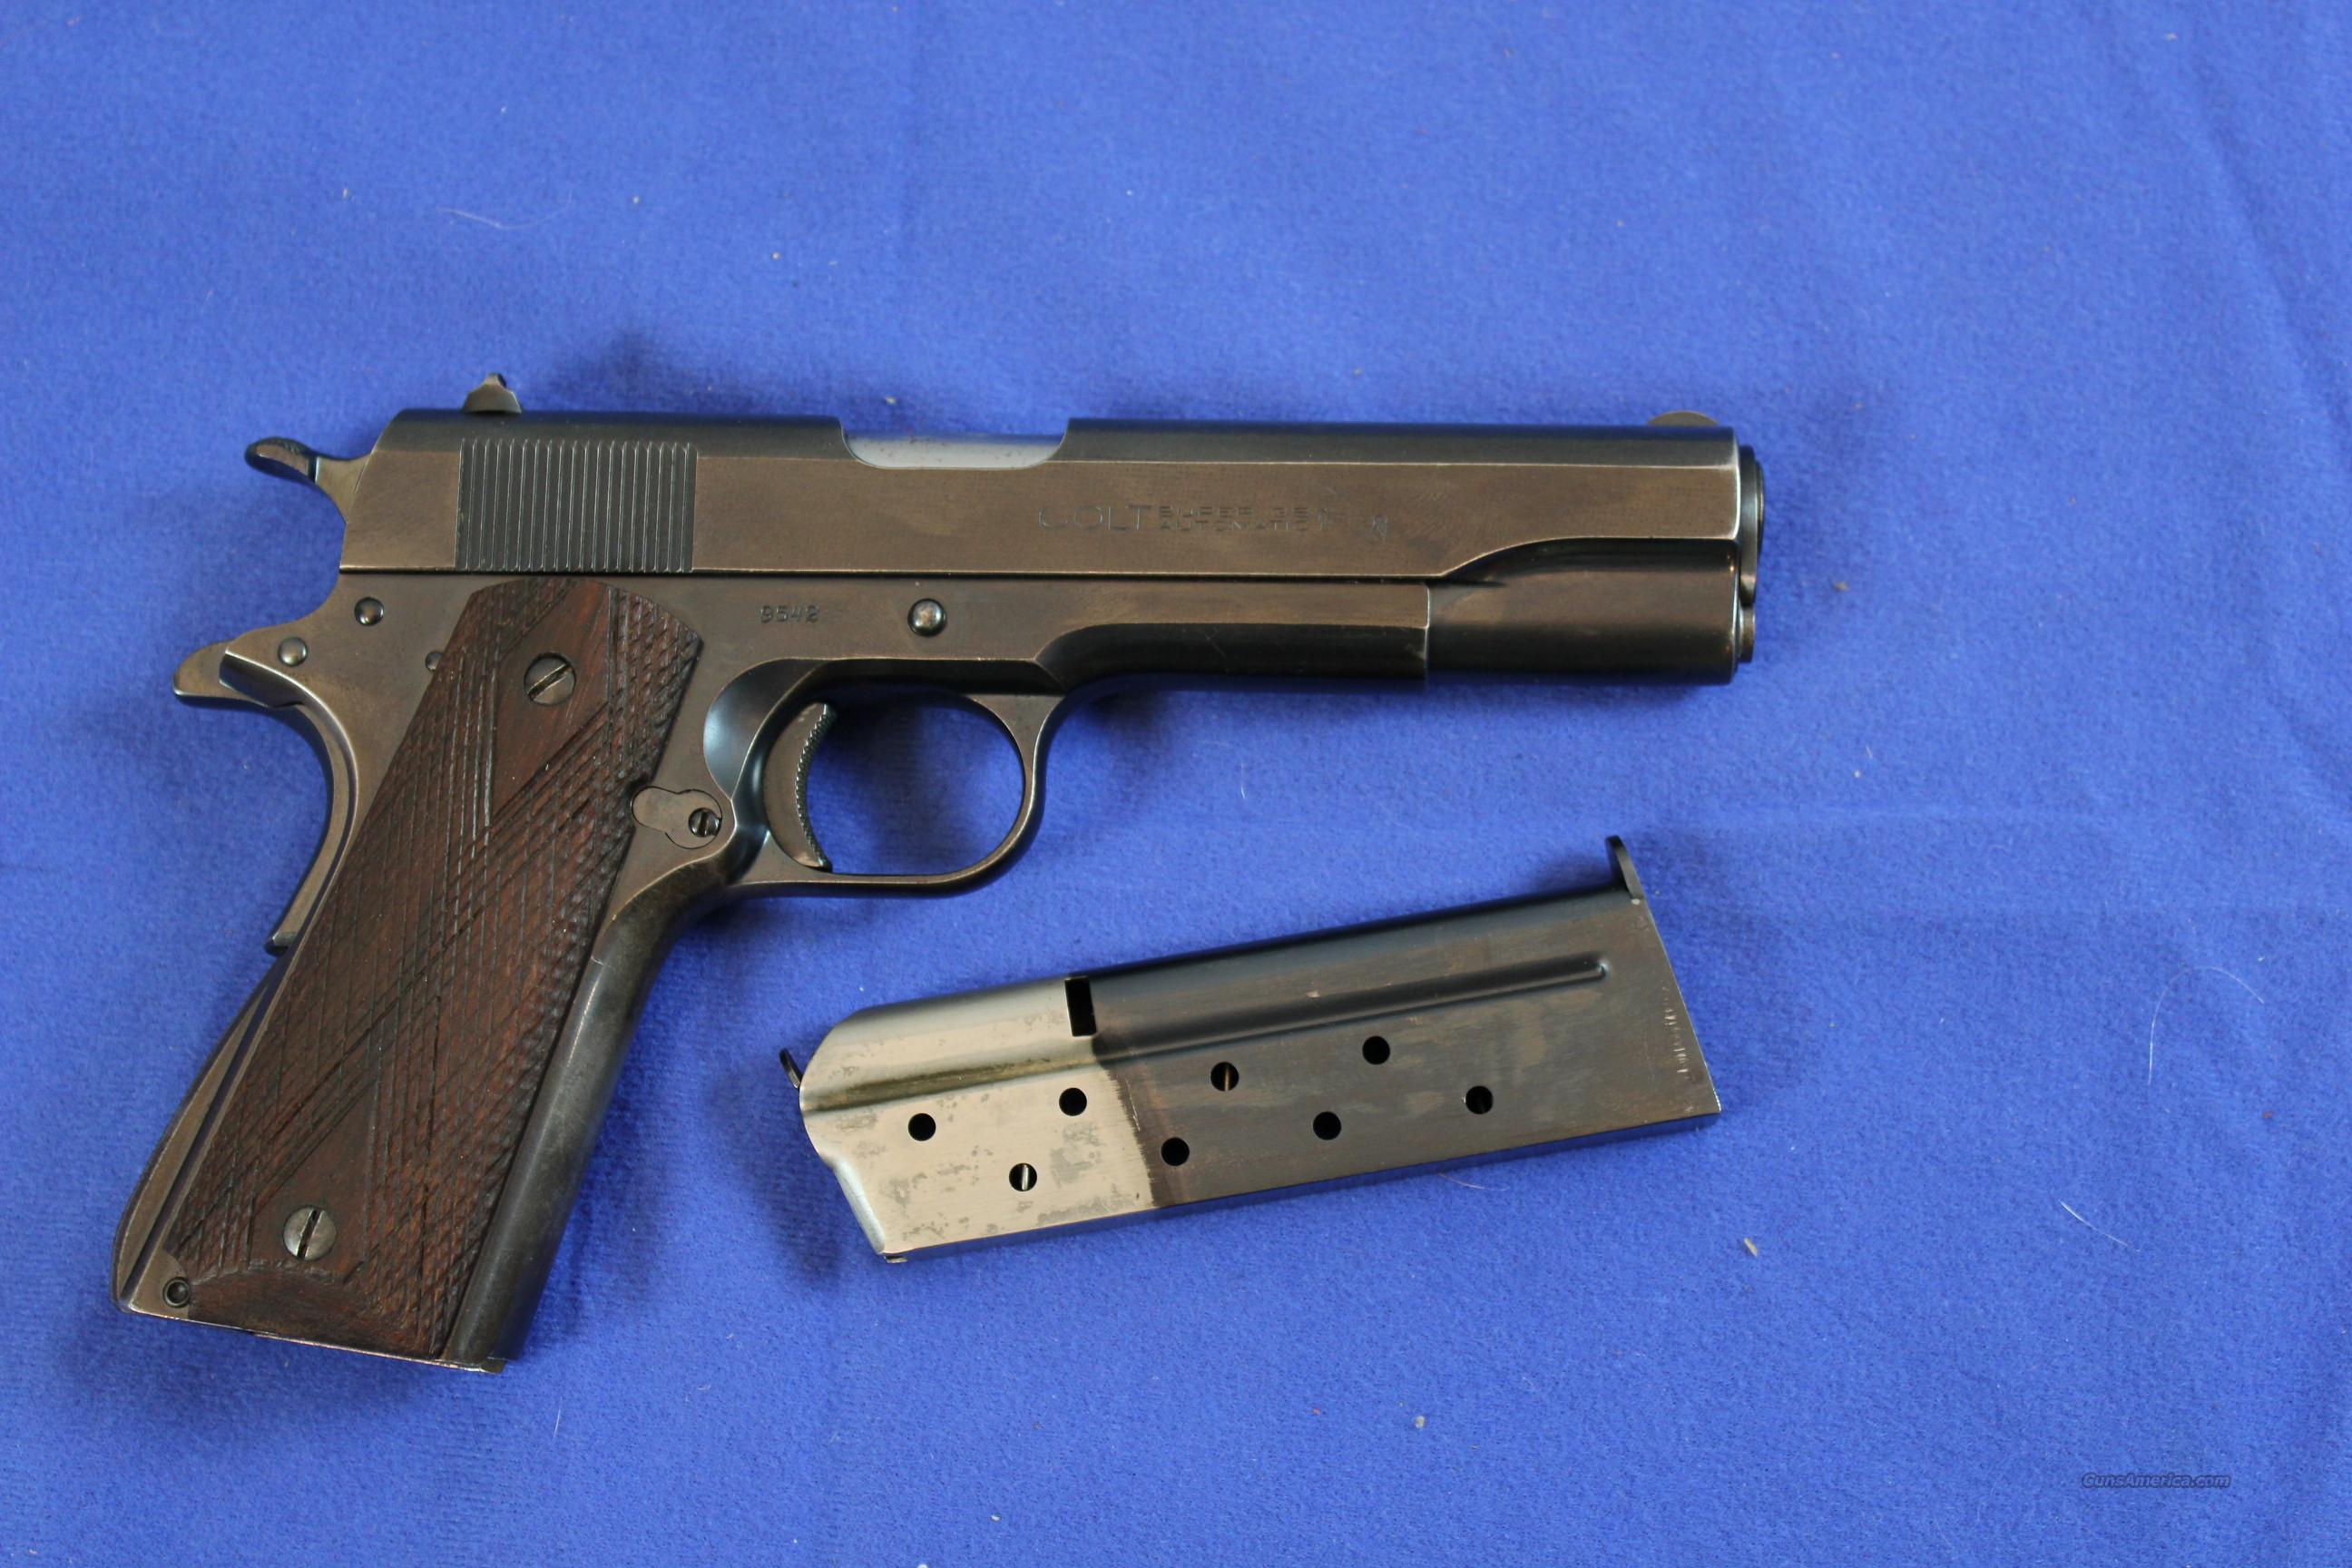 Colt pistol serial ce017xx 38 super